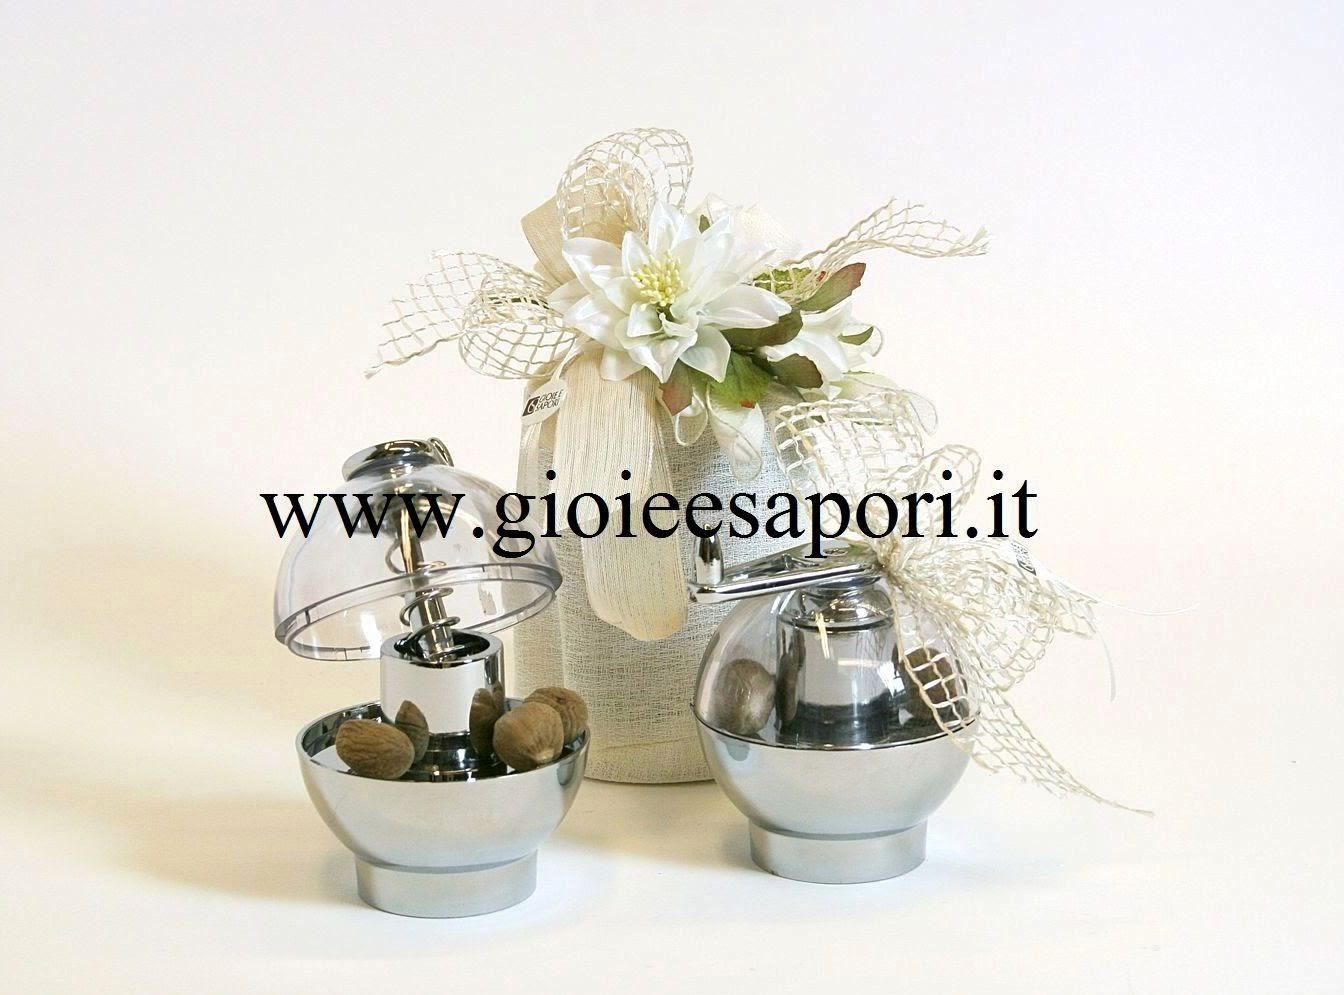 Ben noto Matrimonio Moderno - Il Wedding blog per Spose moderne e Sposi 2.0  UA42